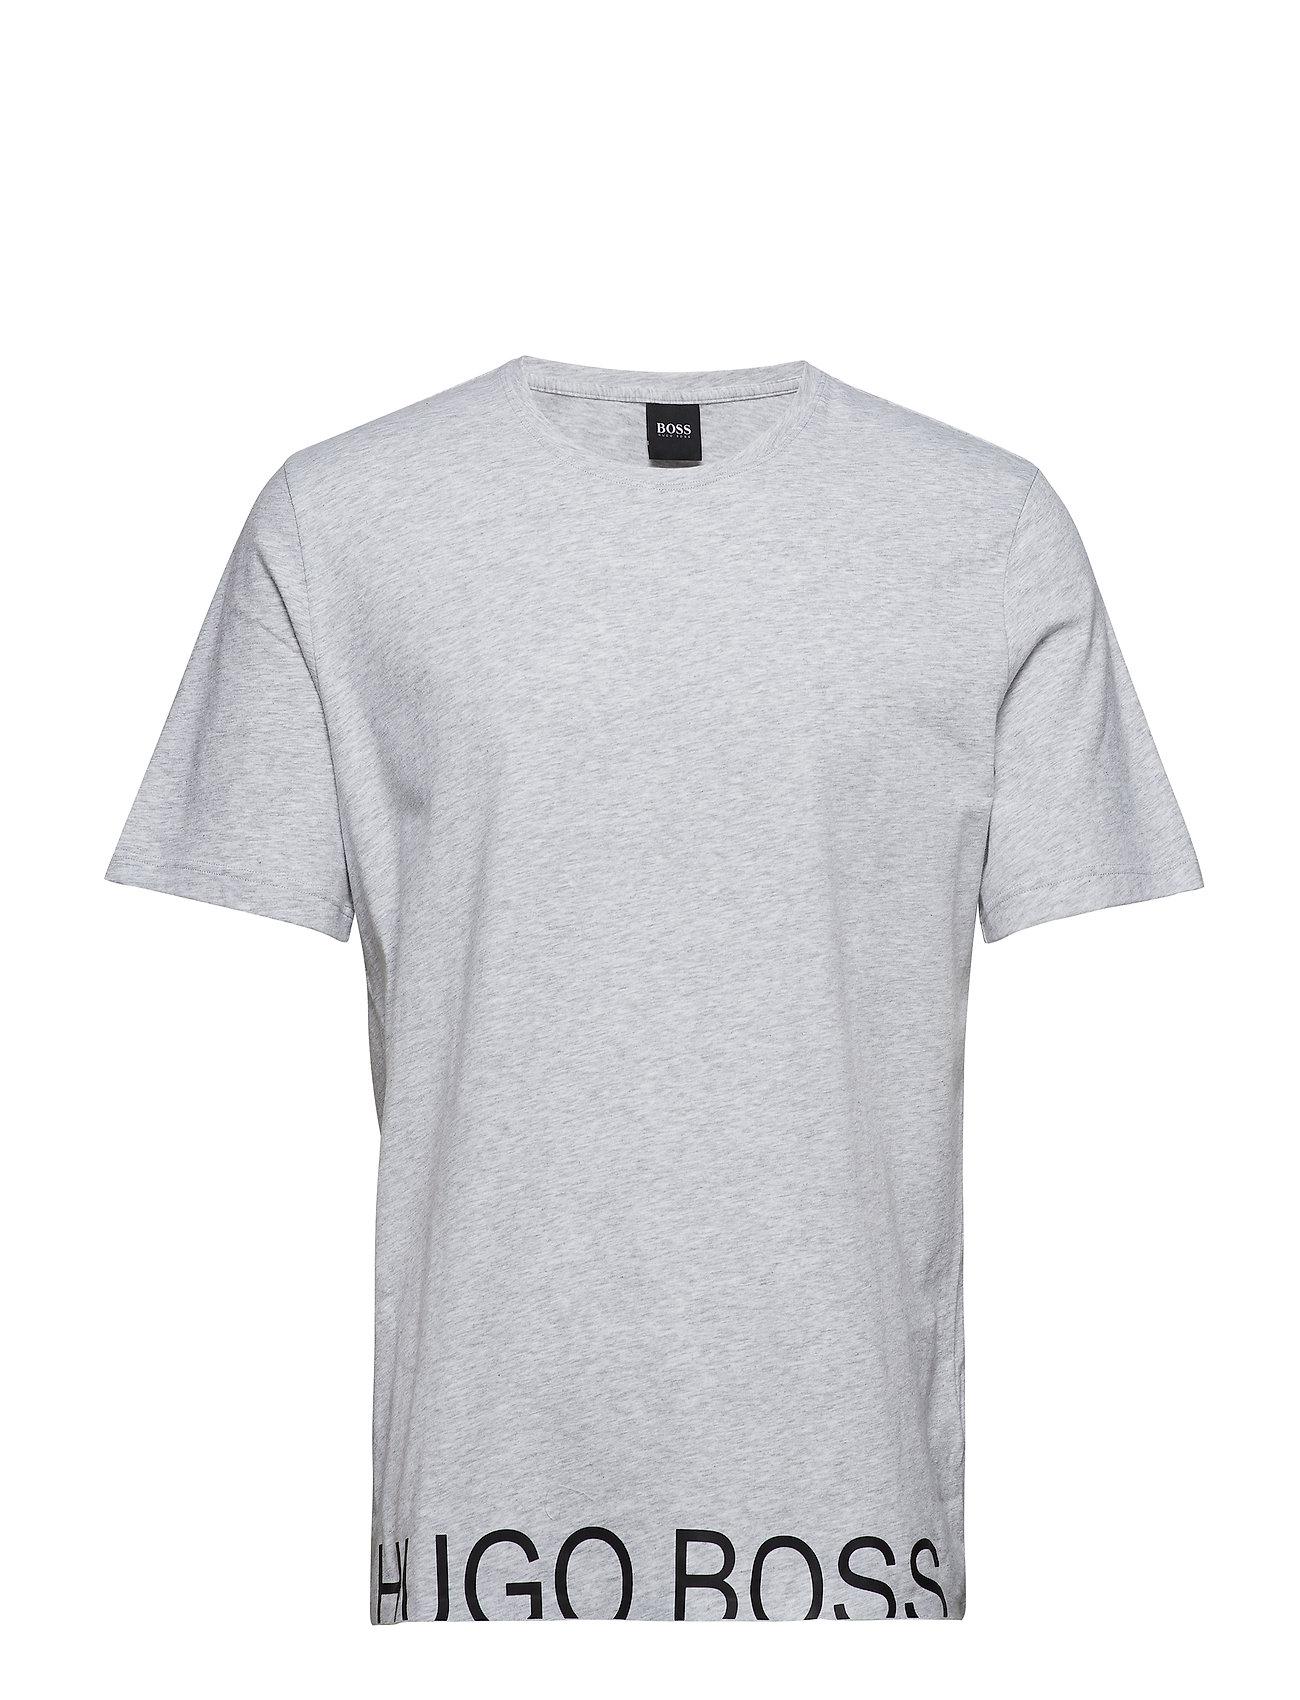 BOSS Business Identity T-Shirt RN - MEDIUM GREY